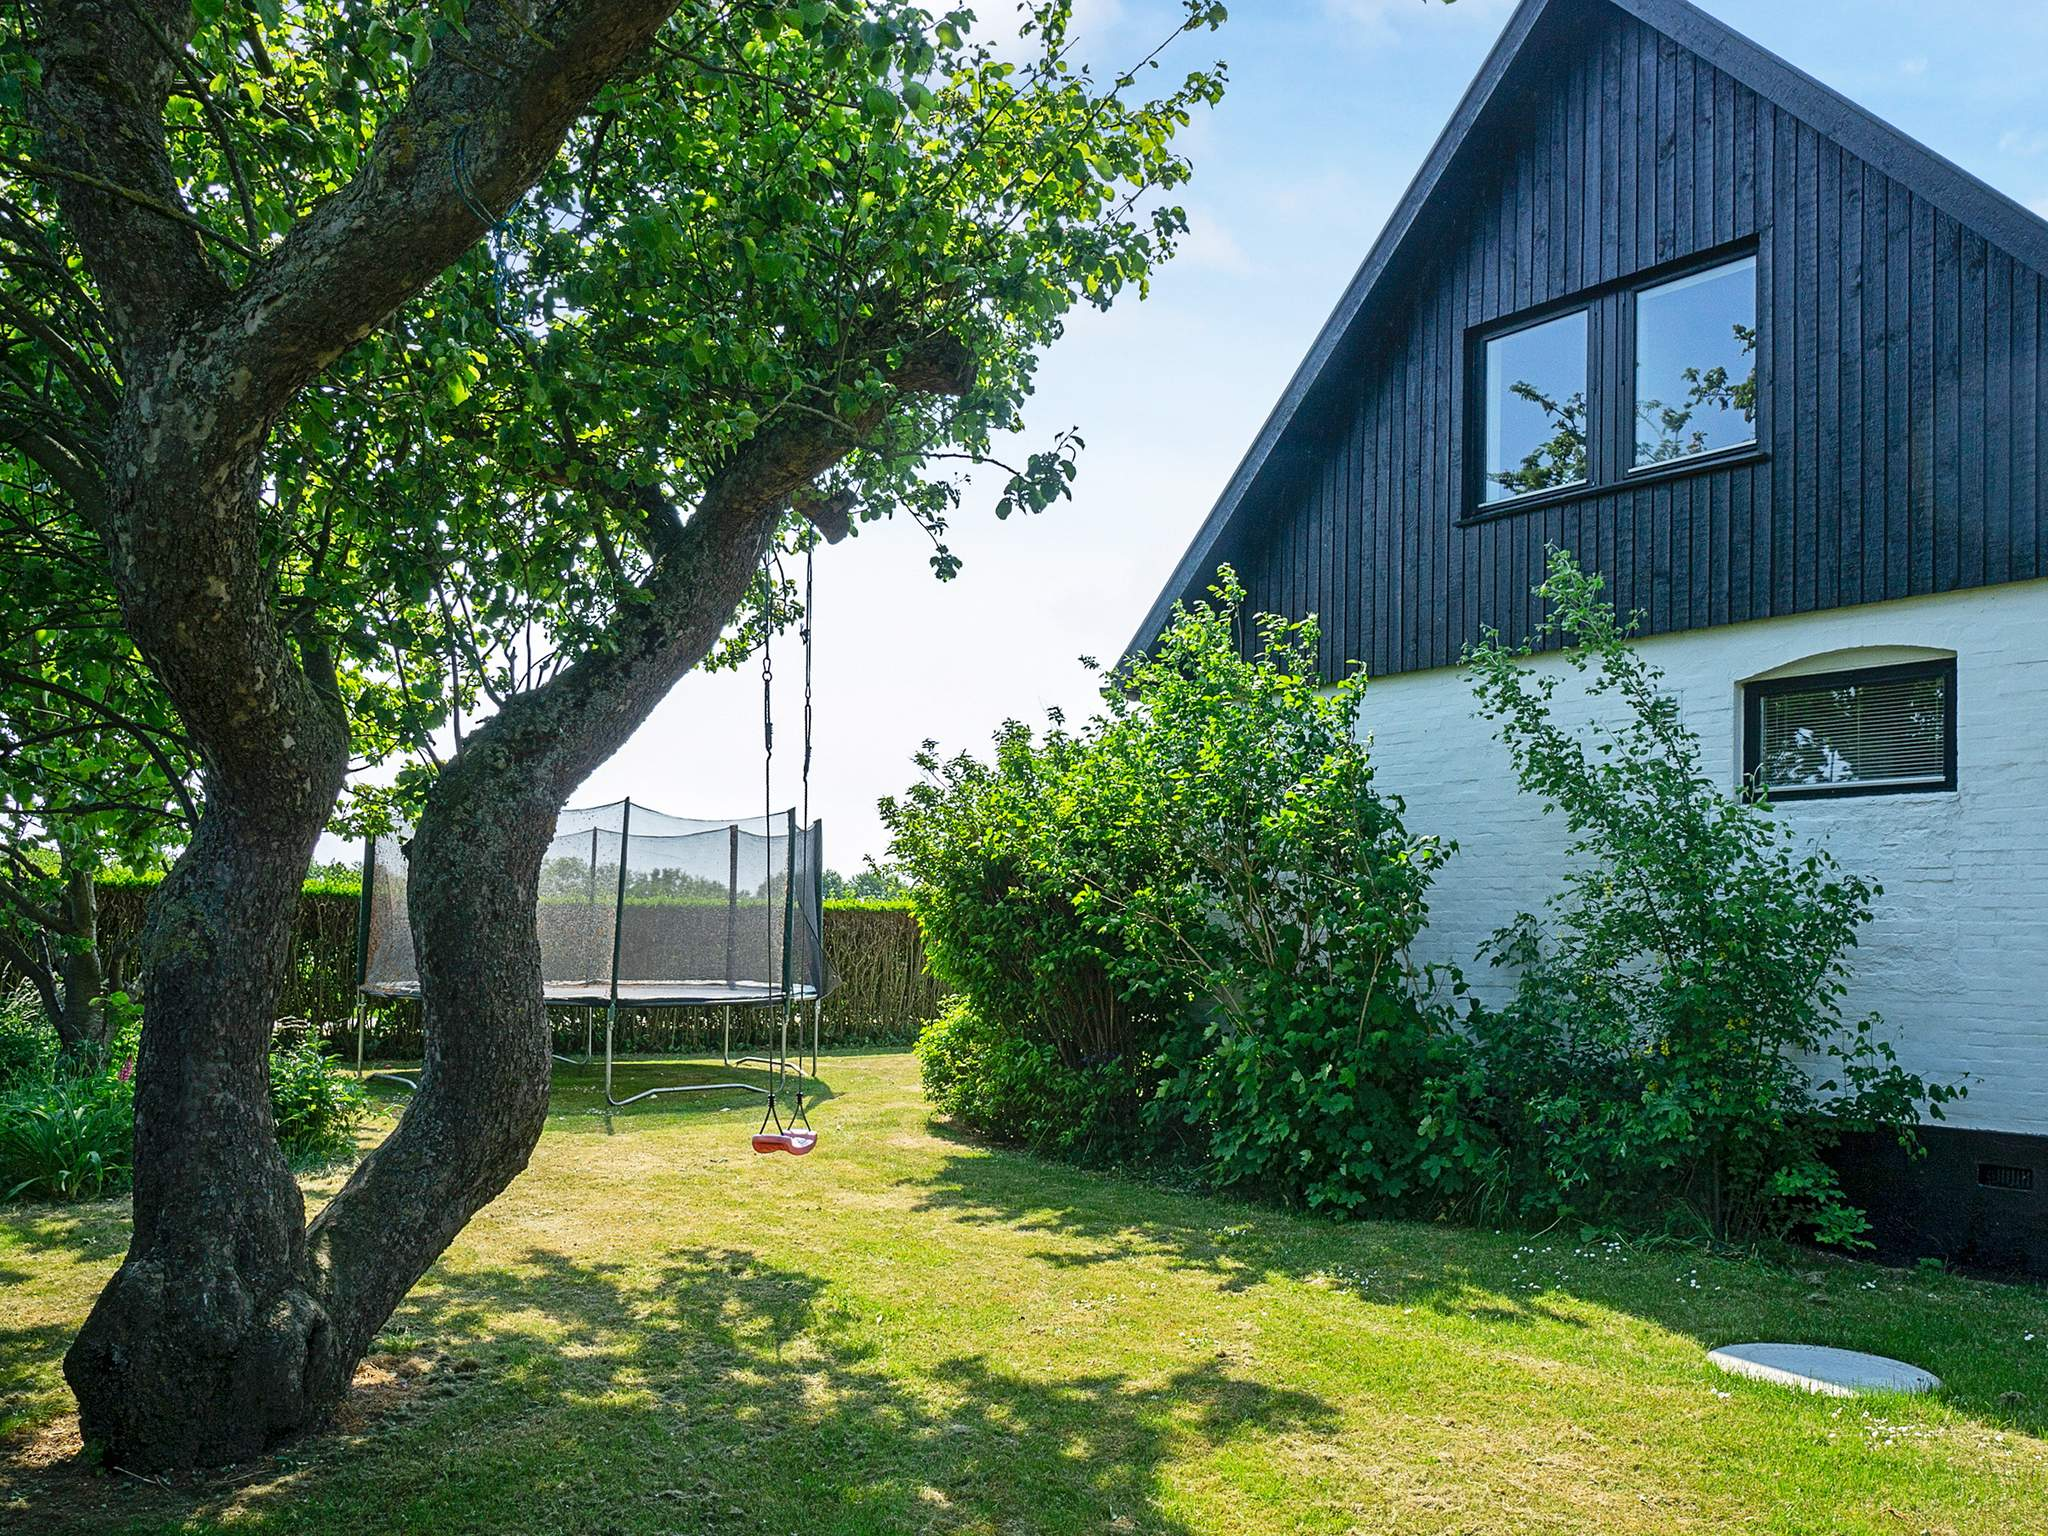 Ferienhaus Balka Strand (2429690), Balke, , Bornholm, Dänemark, Bild 21